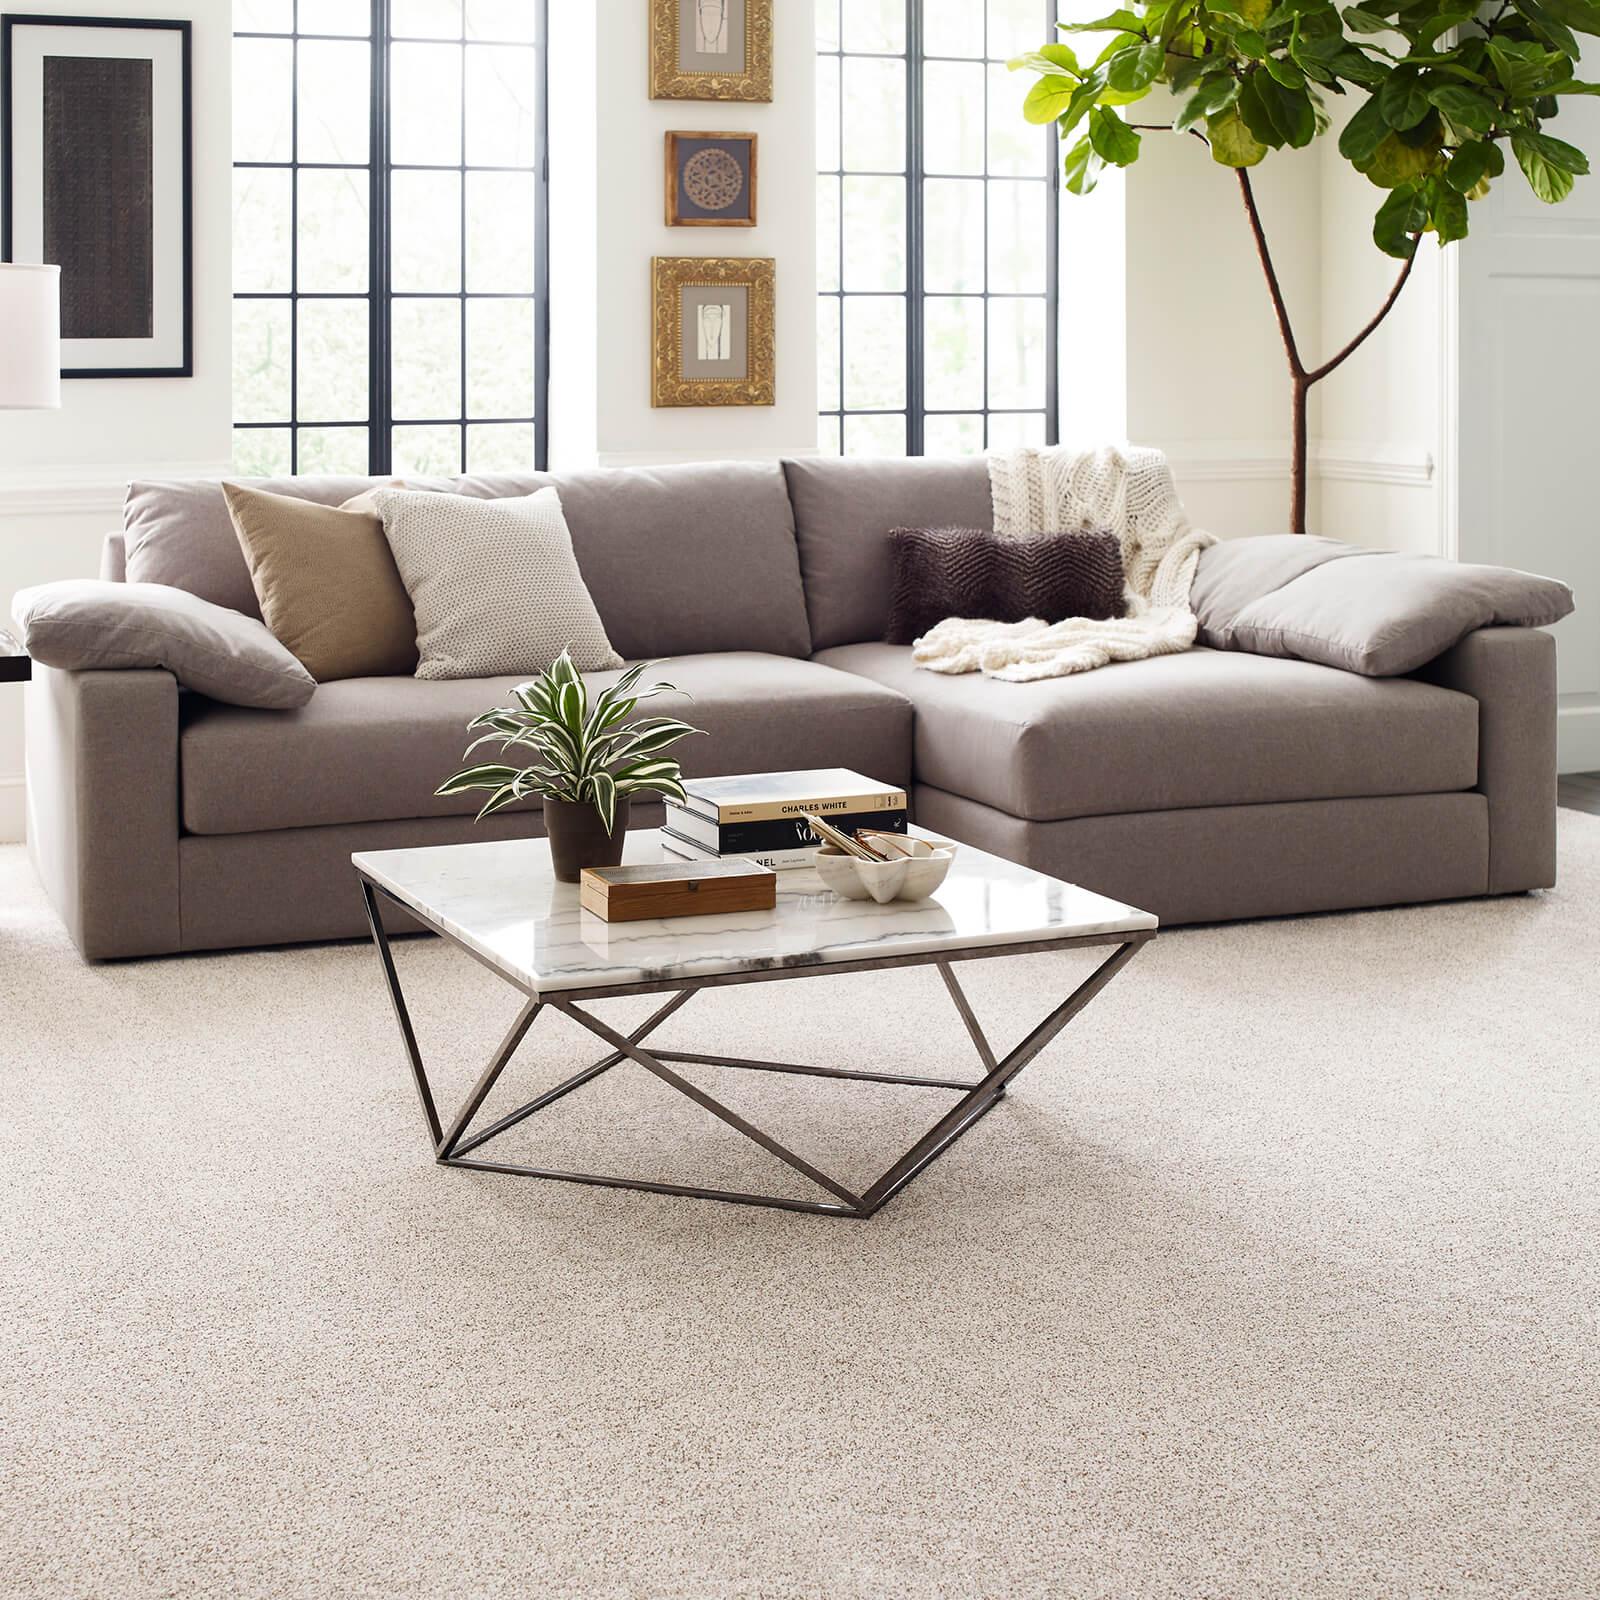 Living room carpet flooring | Carefree Carpets & Floors